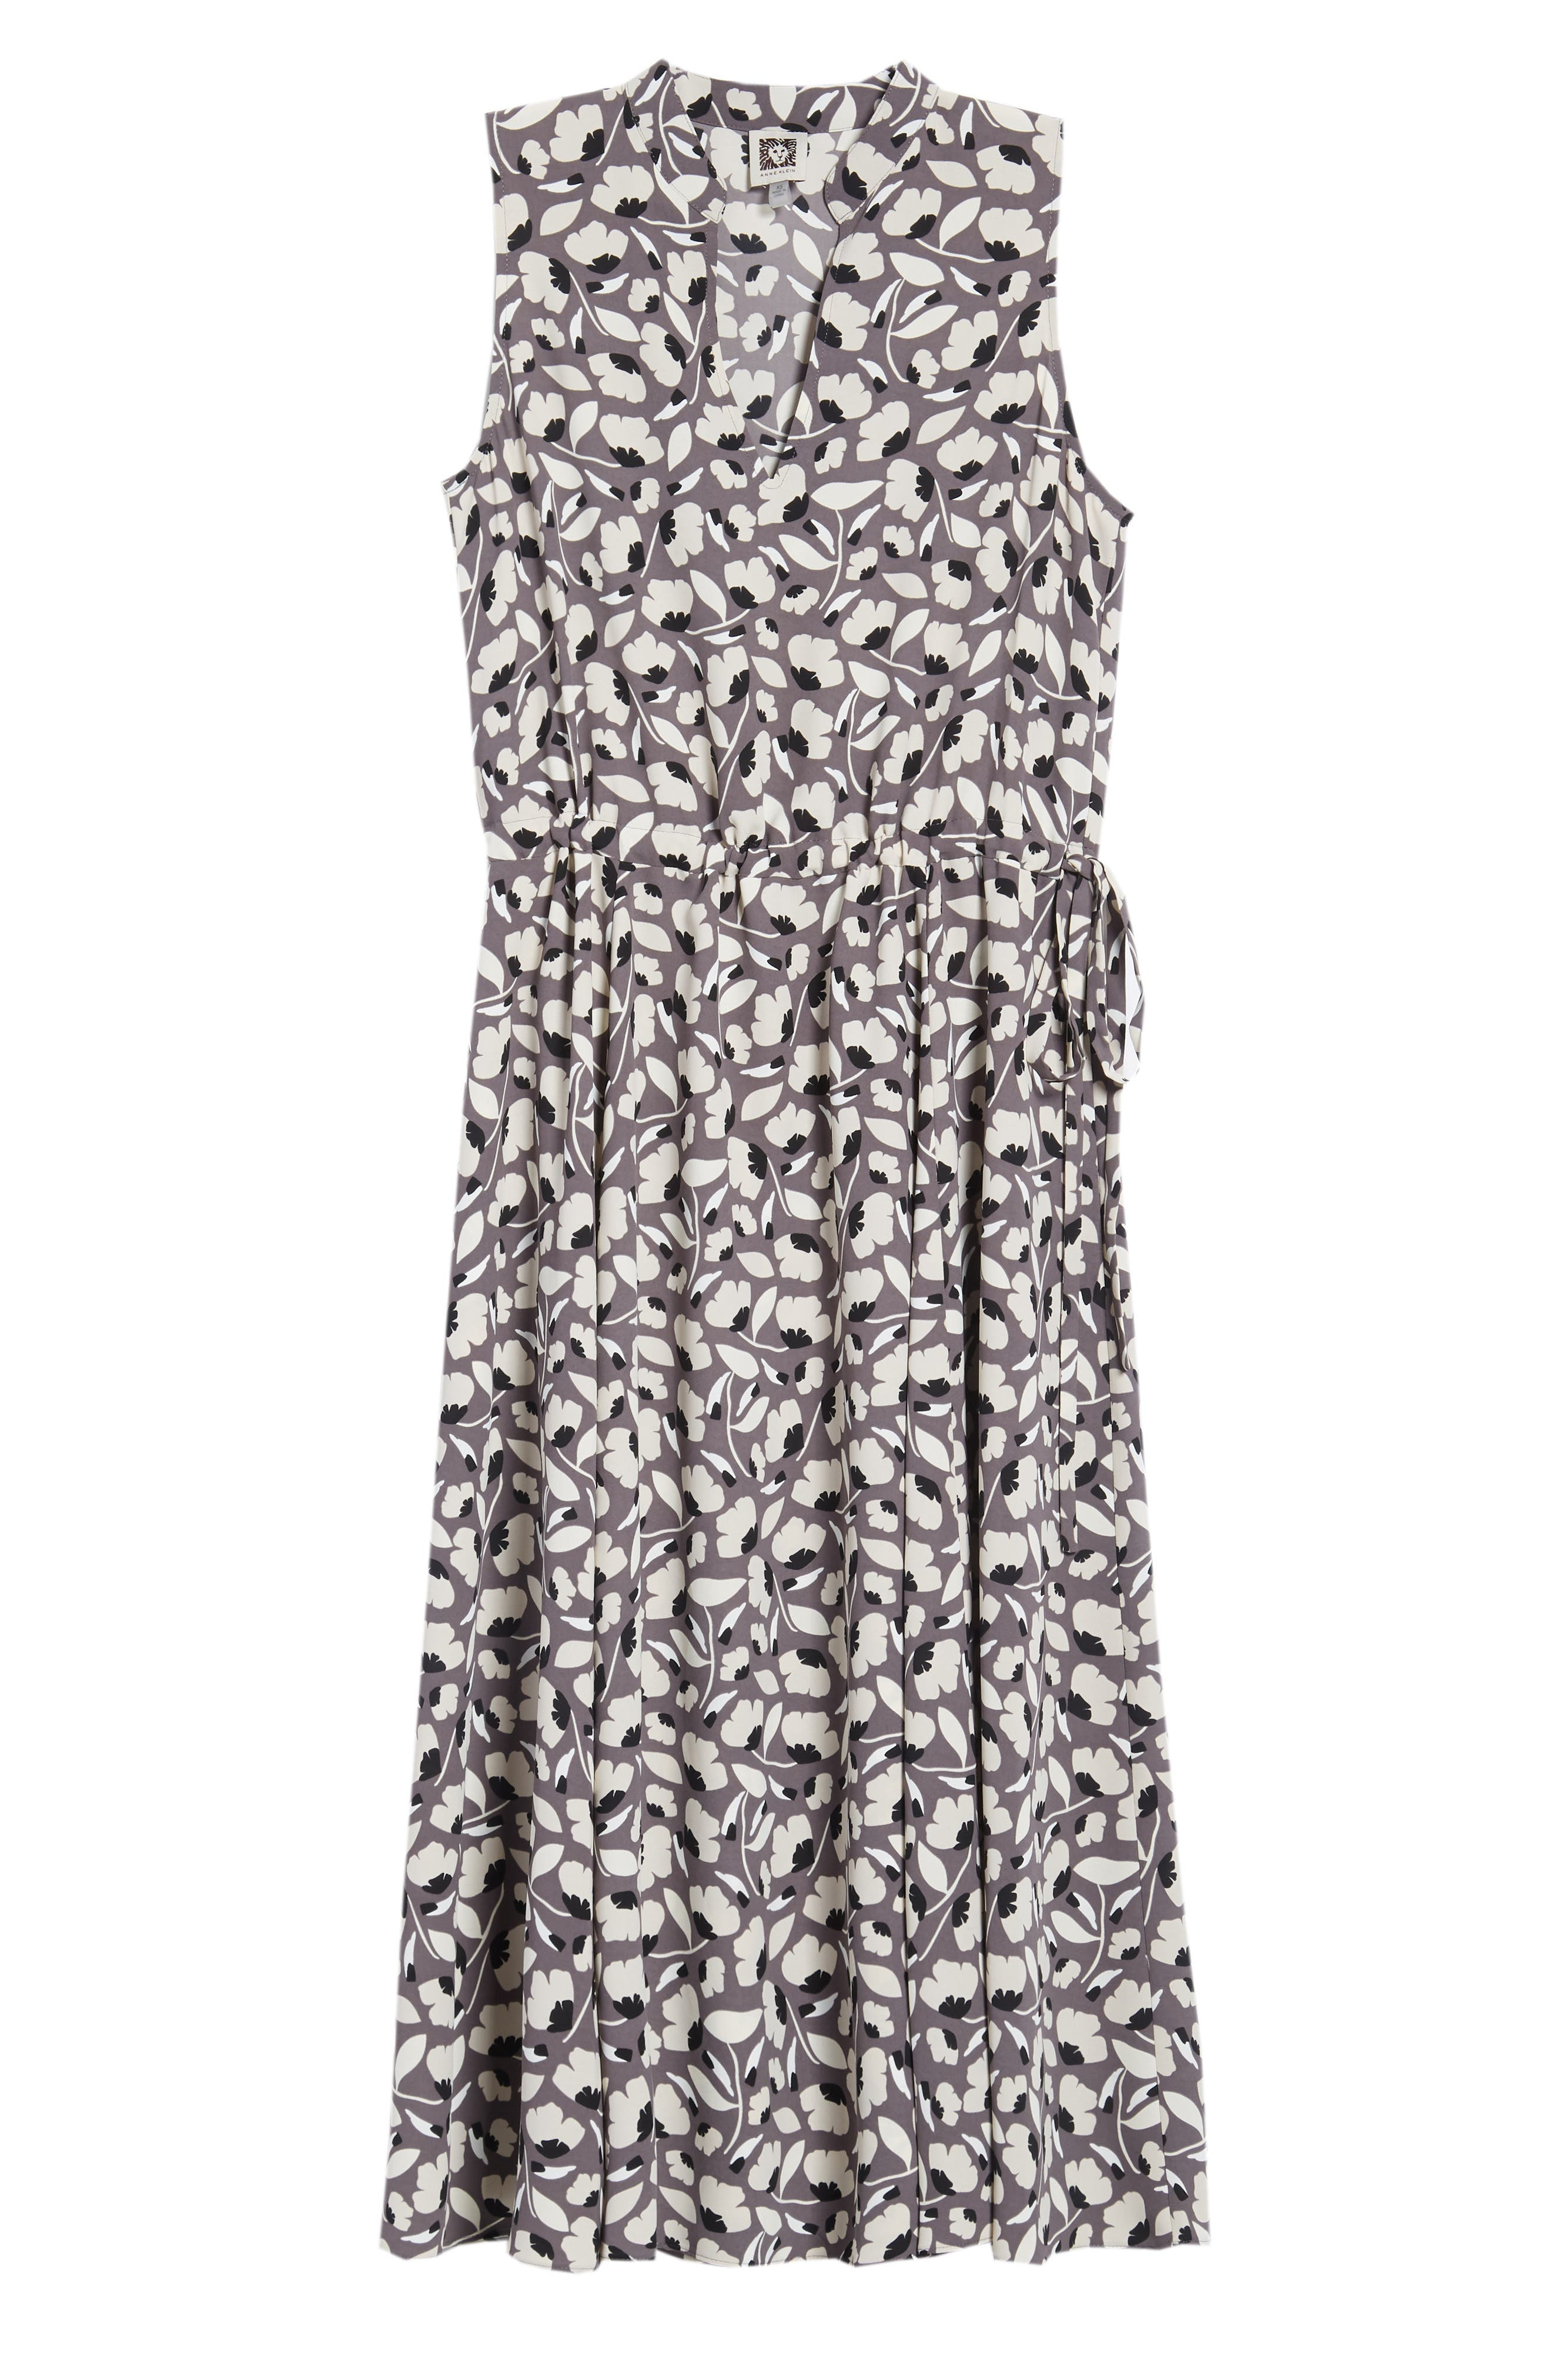 Floral Drawstring Dress,                             Alternate thumbnail 7, color,                             020